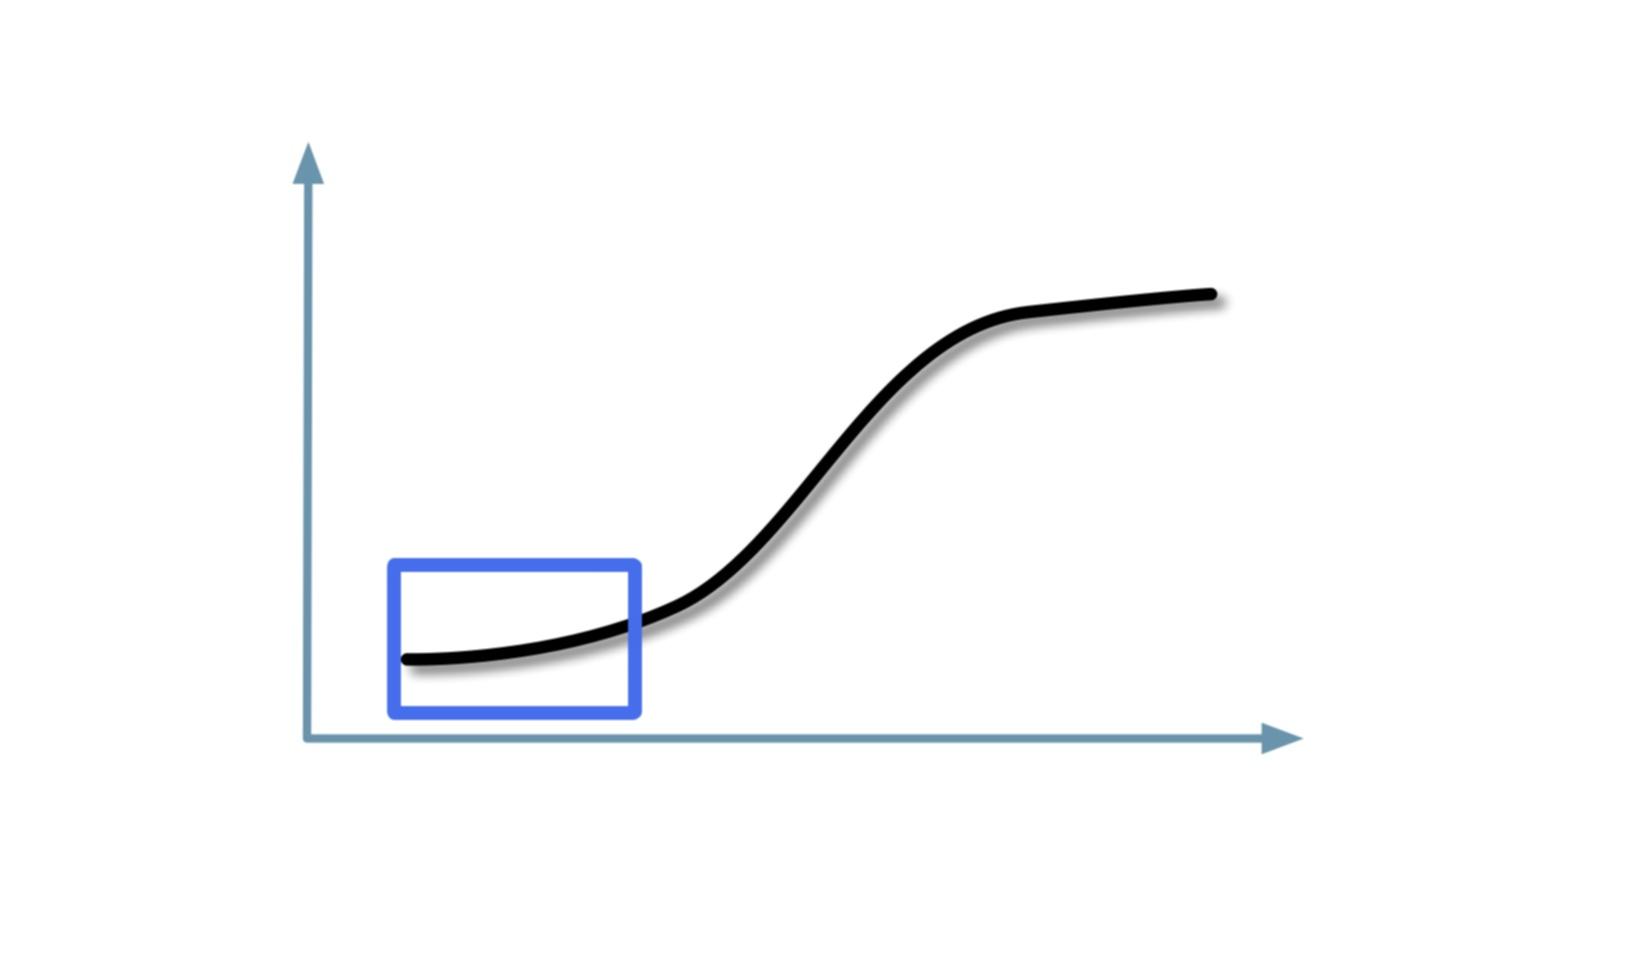 innovation-s-curve-1.jpg